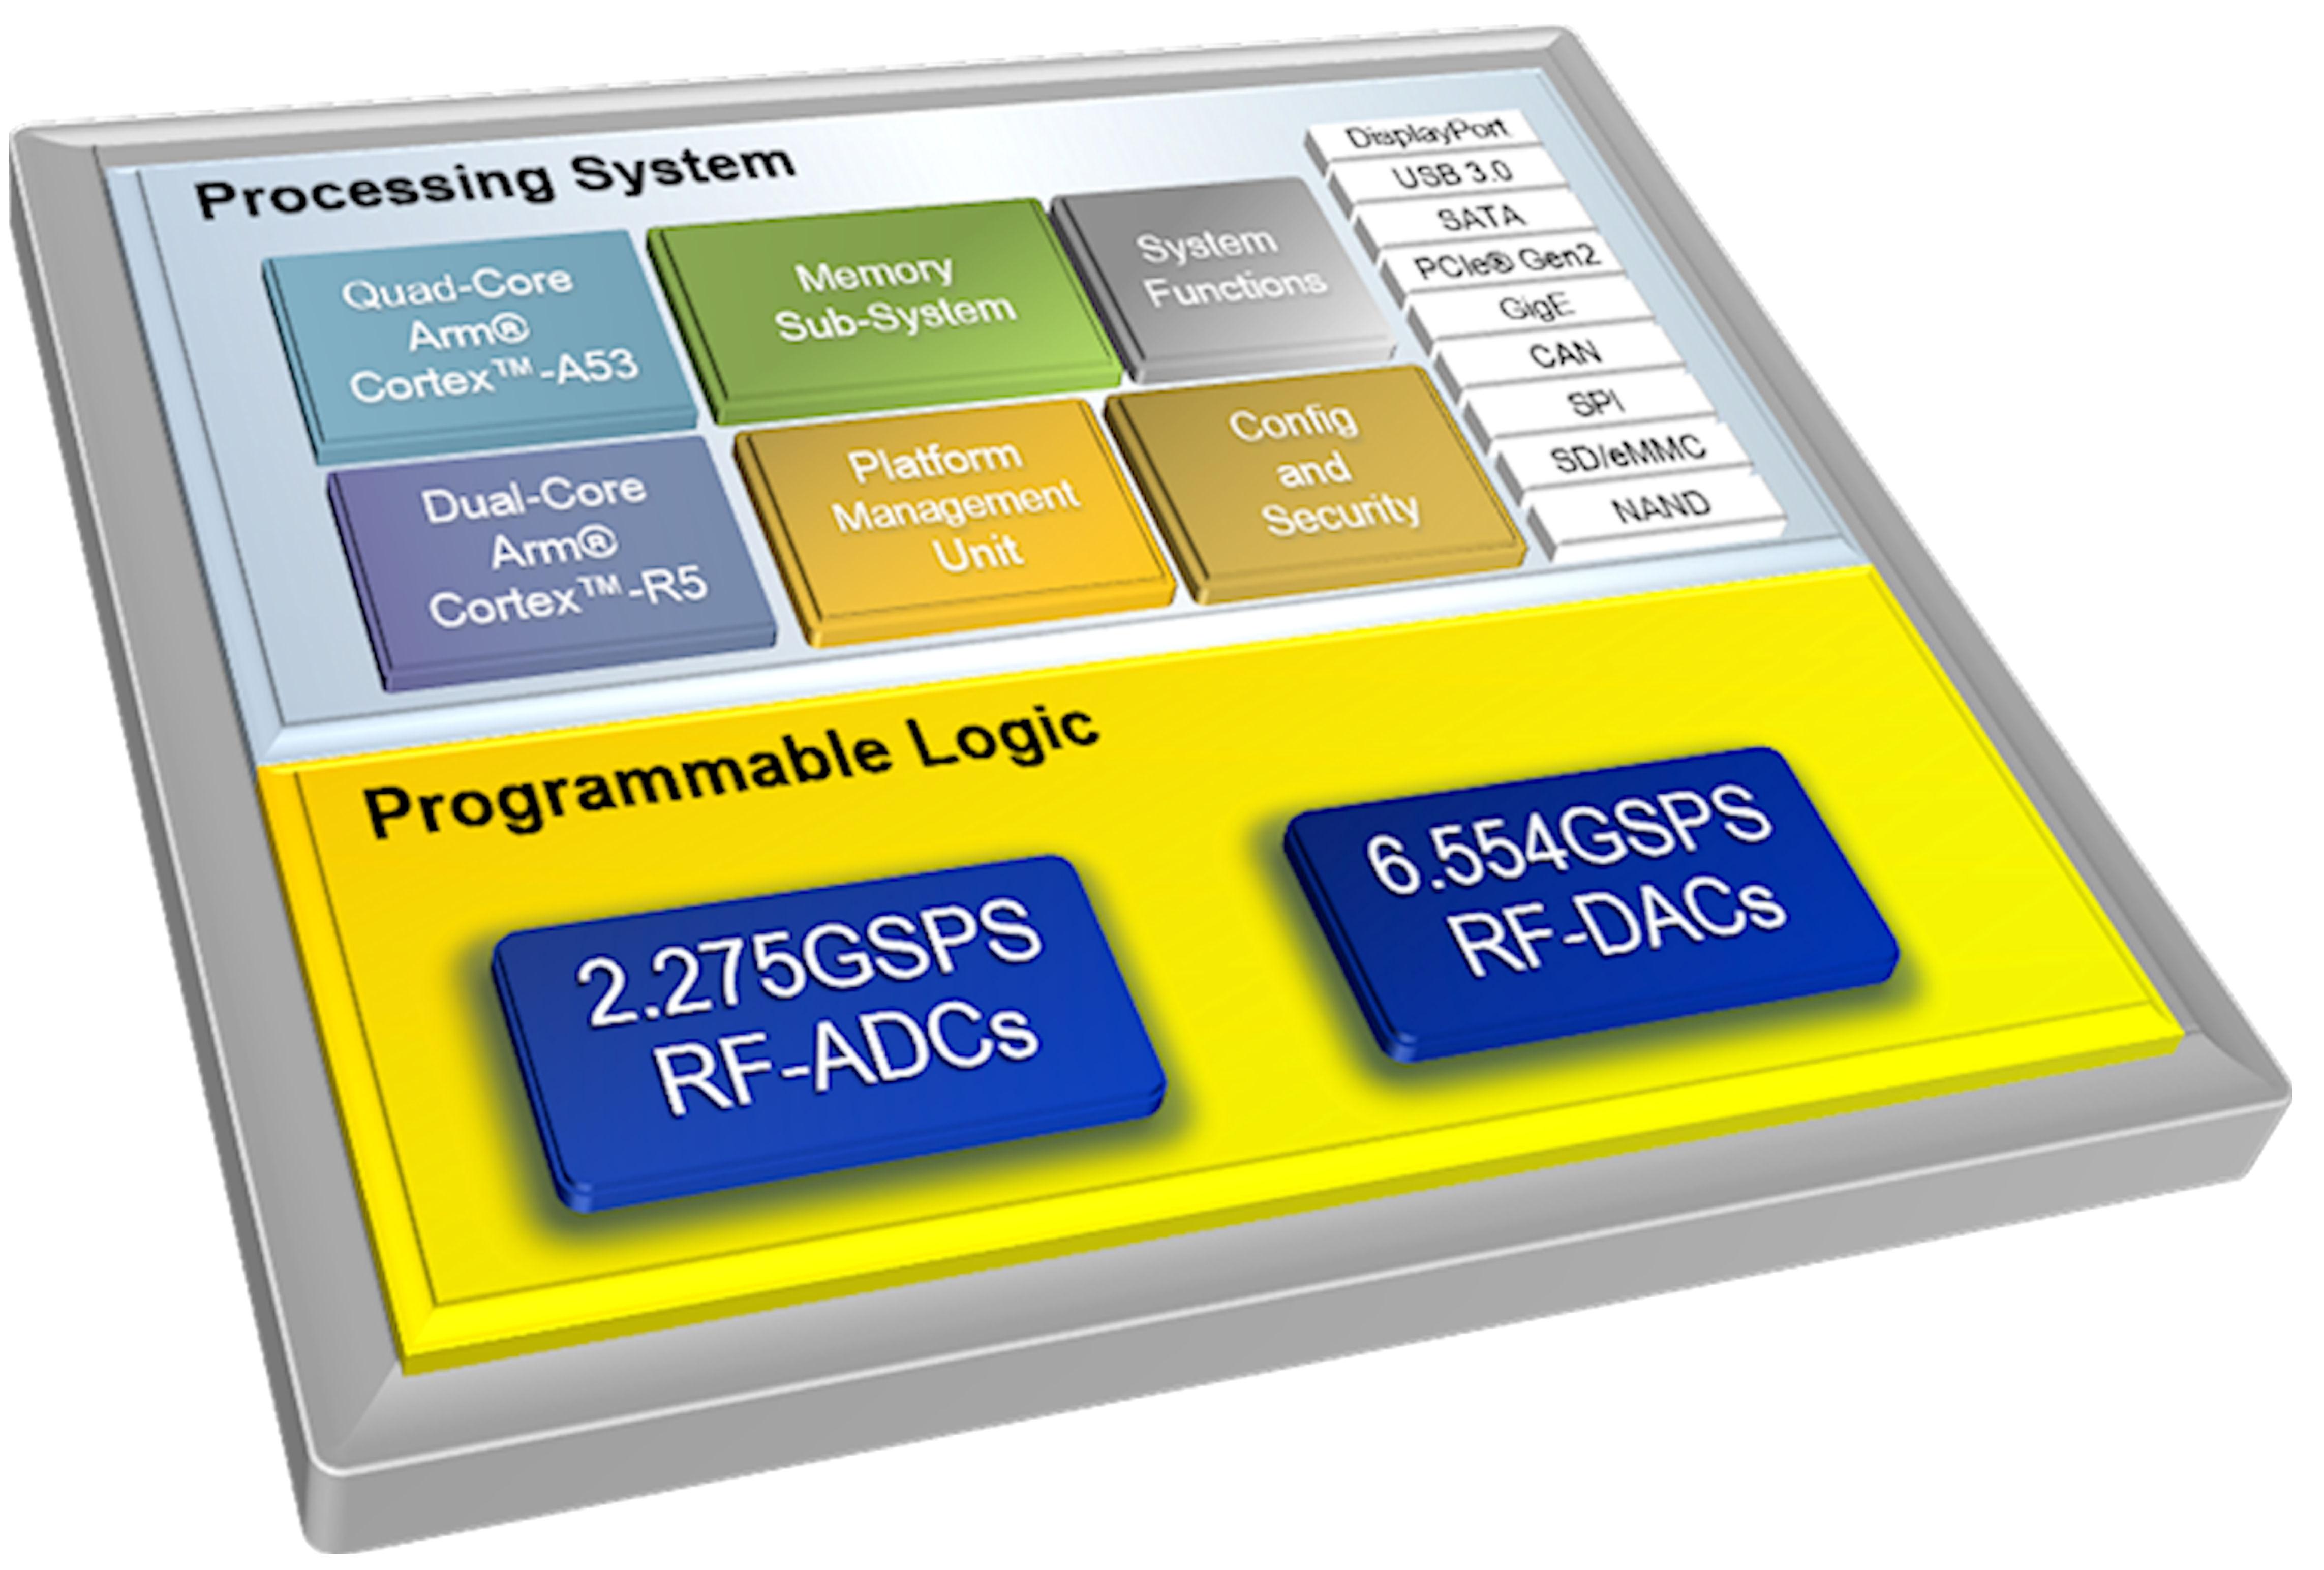 Xilinx extends Zynq to sub-6GHz spectrum